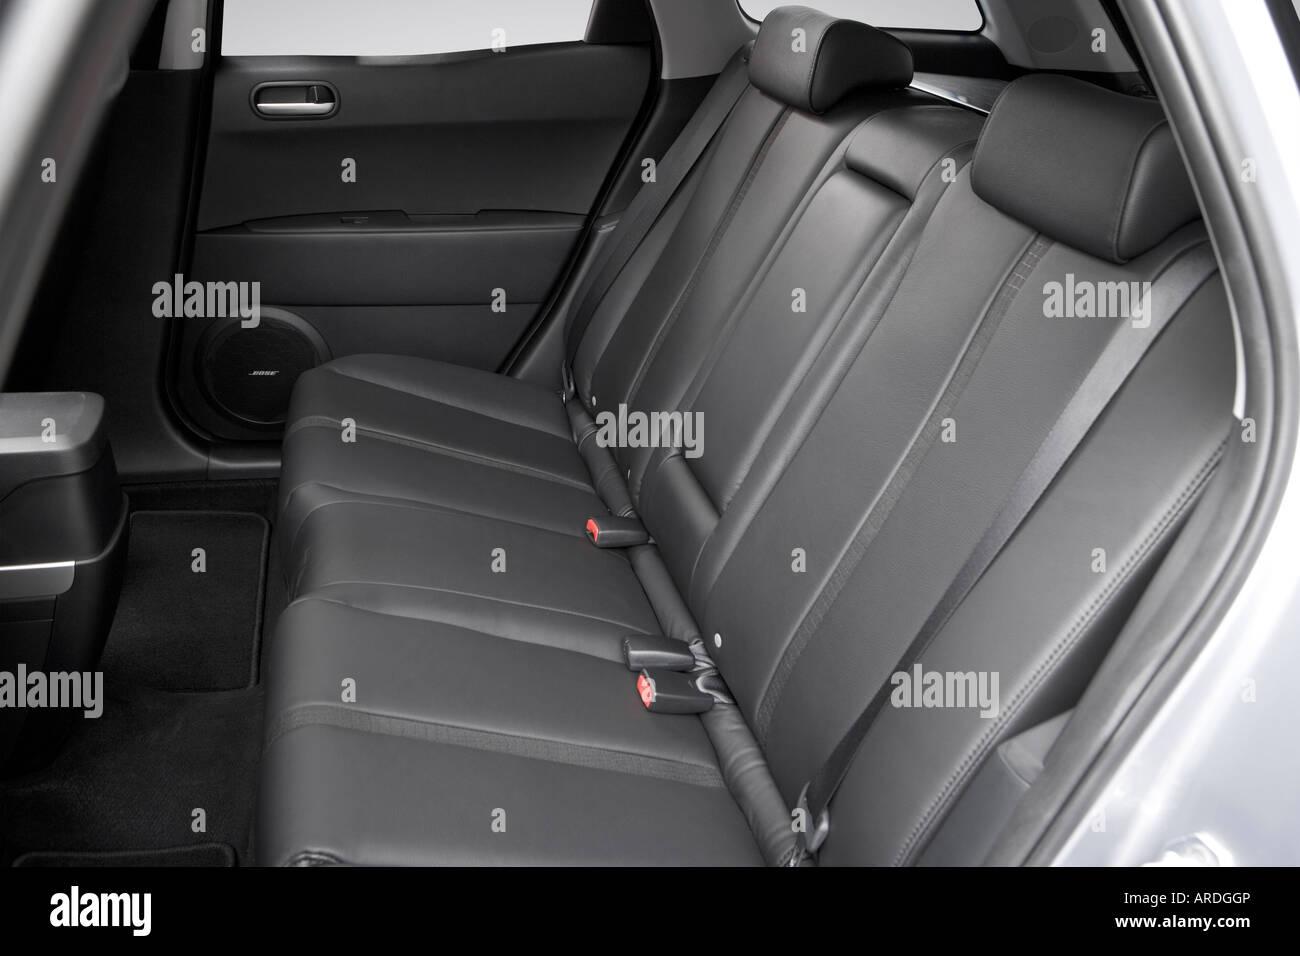 2007 mazda cx-7 grand touring in gray - rear seats stock photo